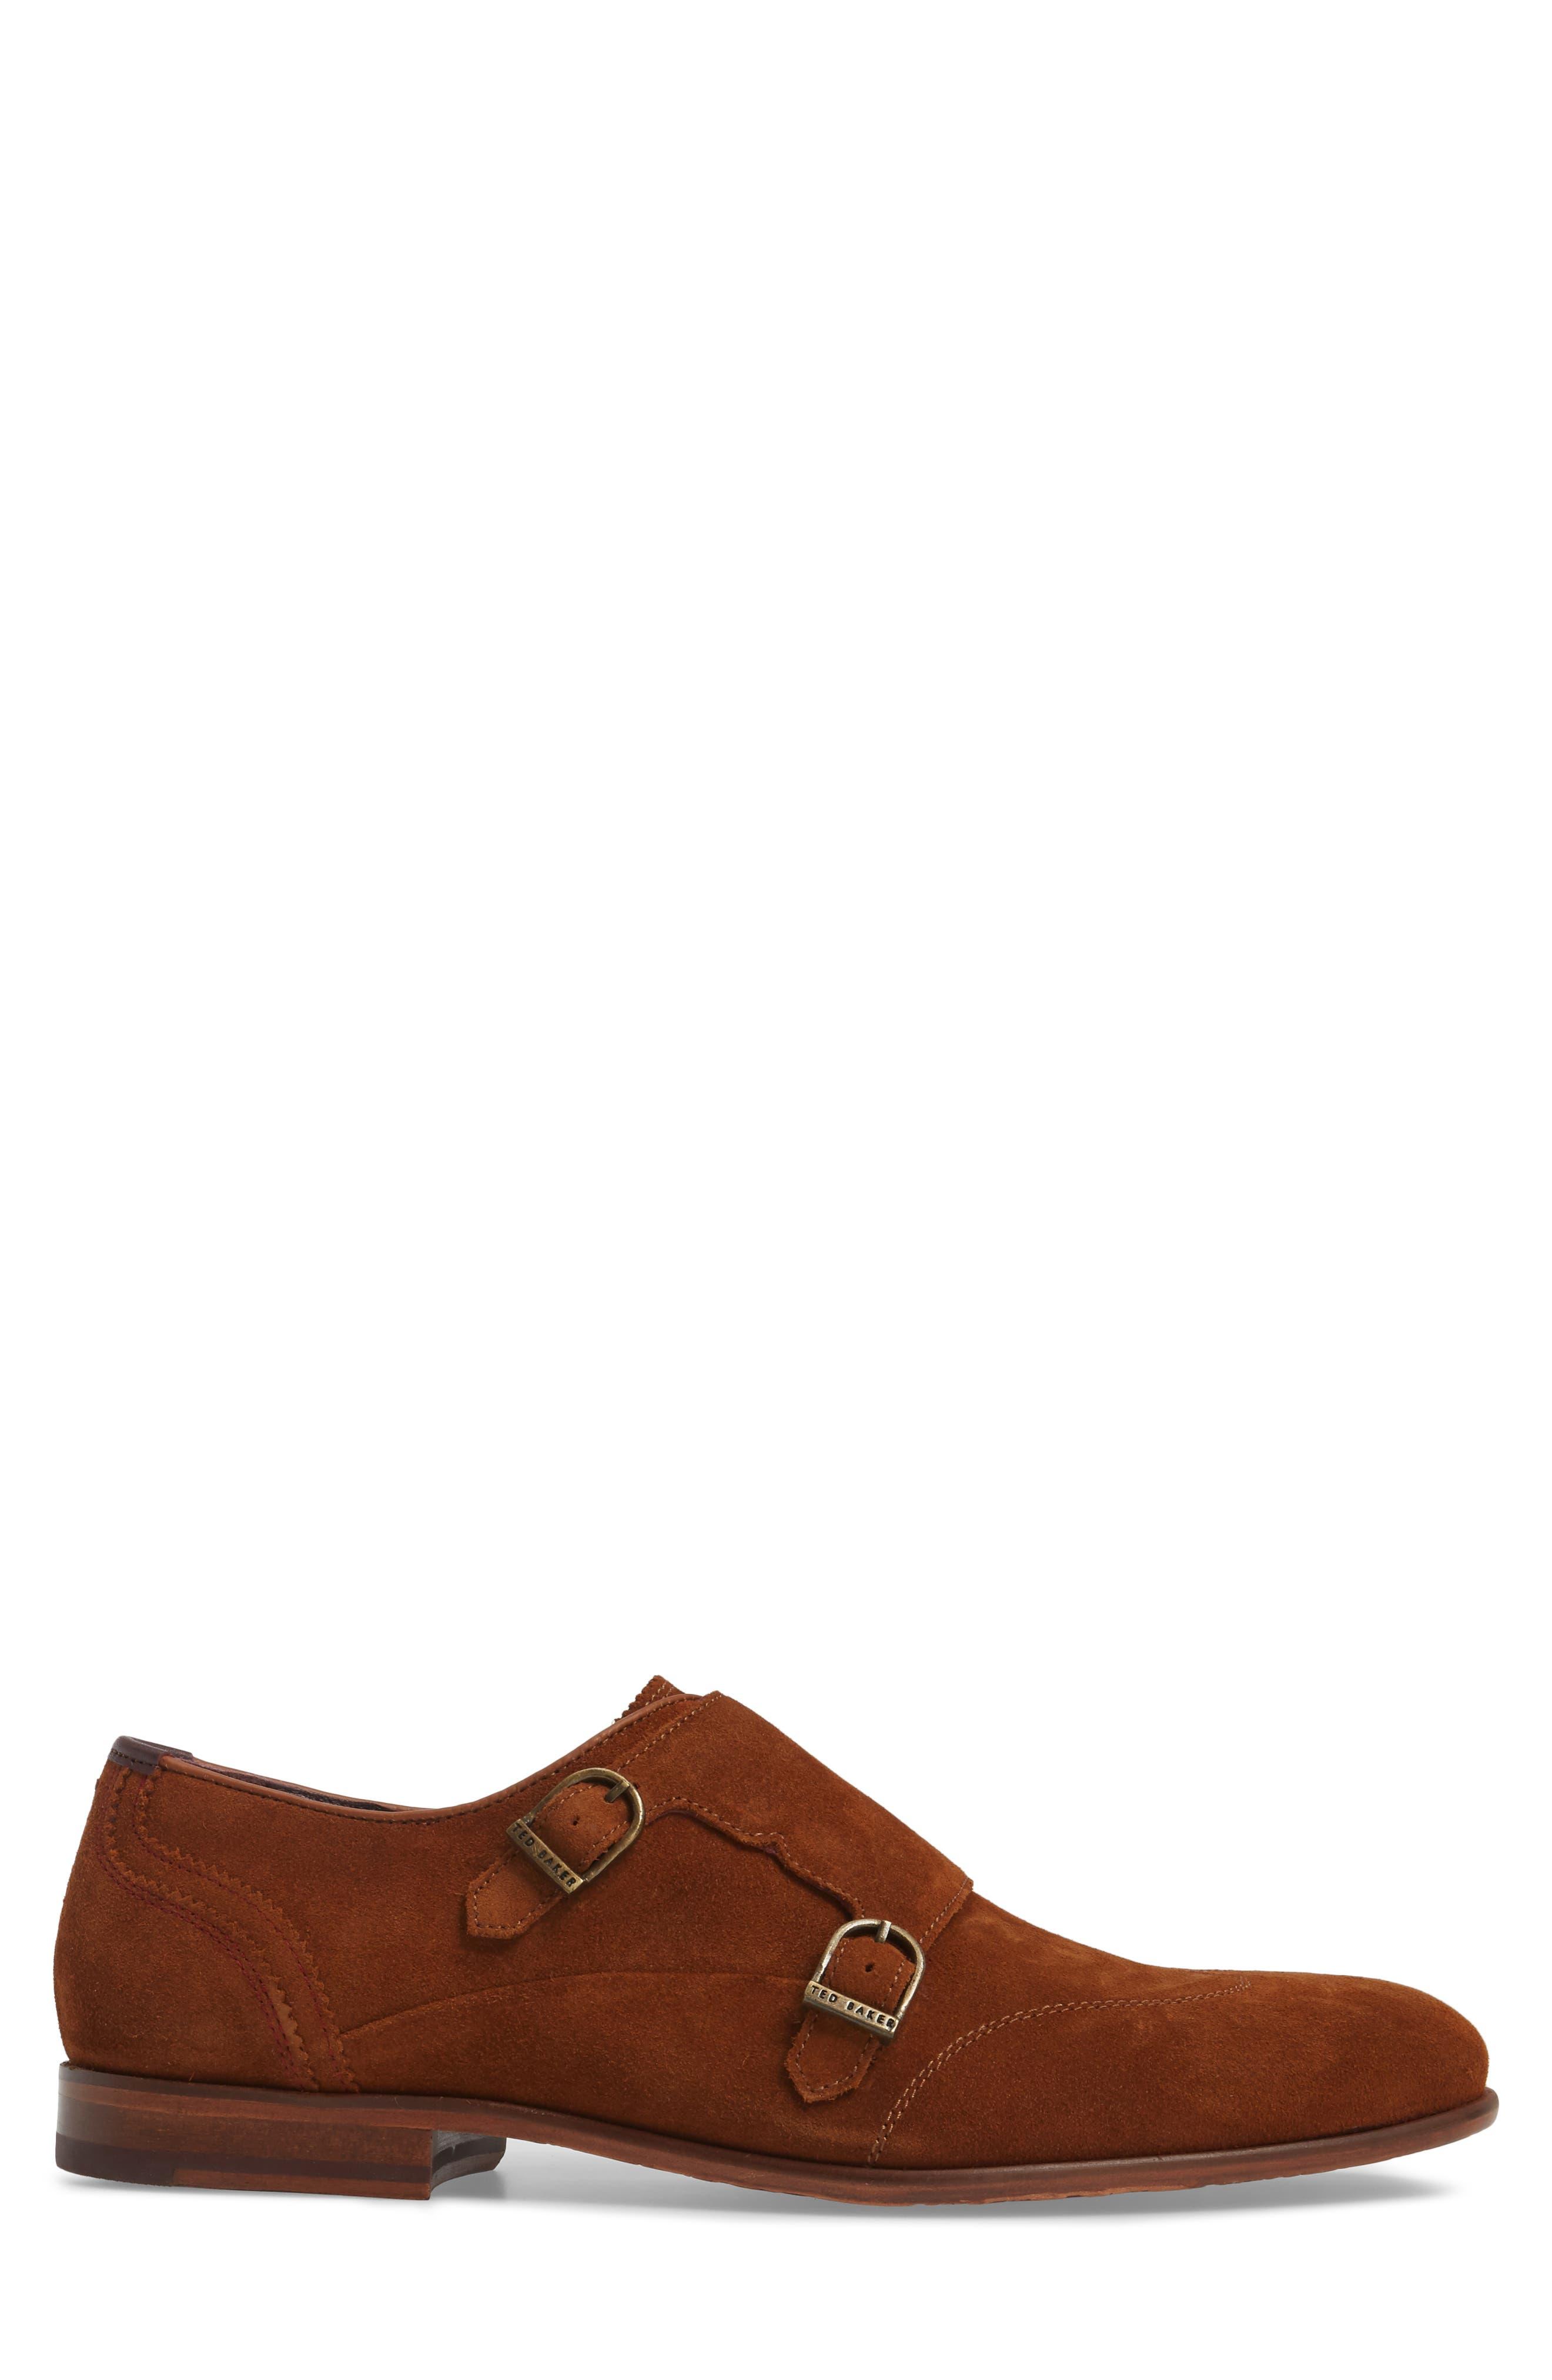 Rovere Wingtip Monk Shoe,                             Alternate thumbnail 3, color,                             TAN SUEDE